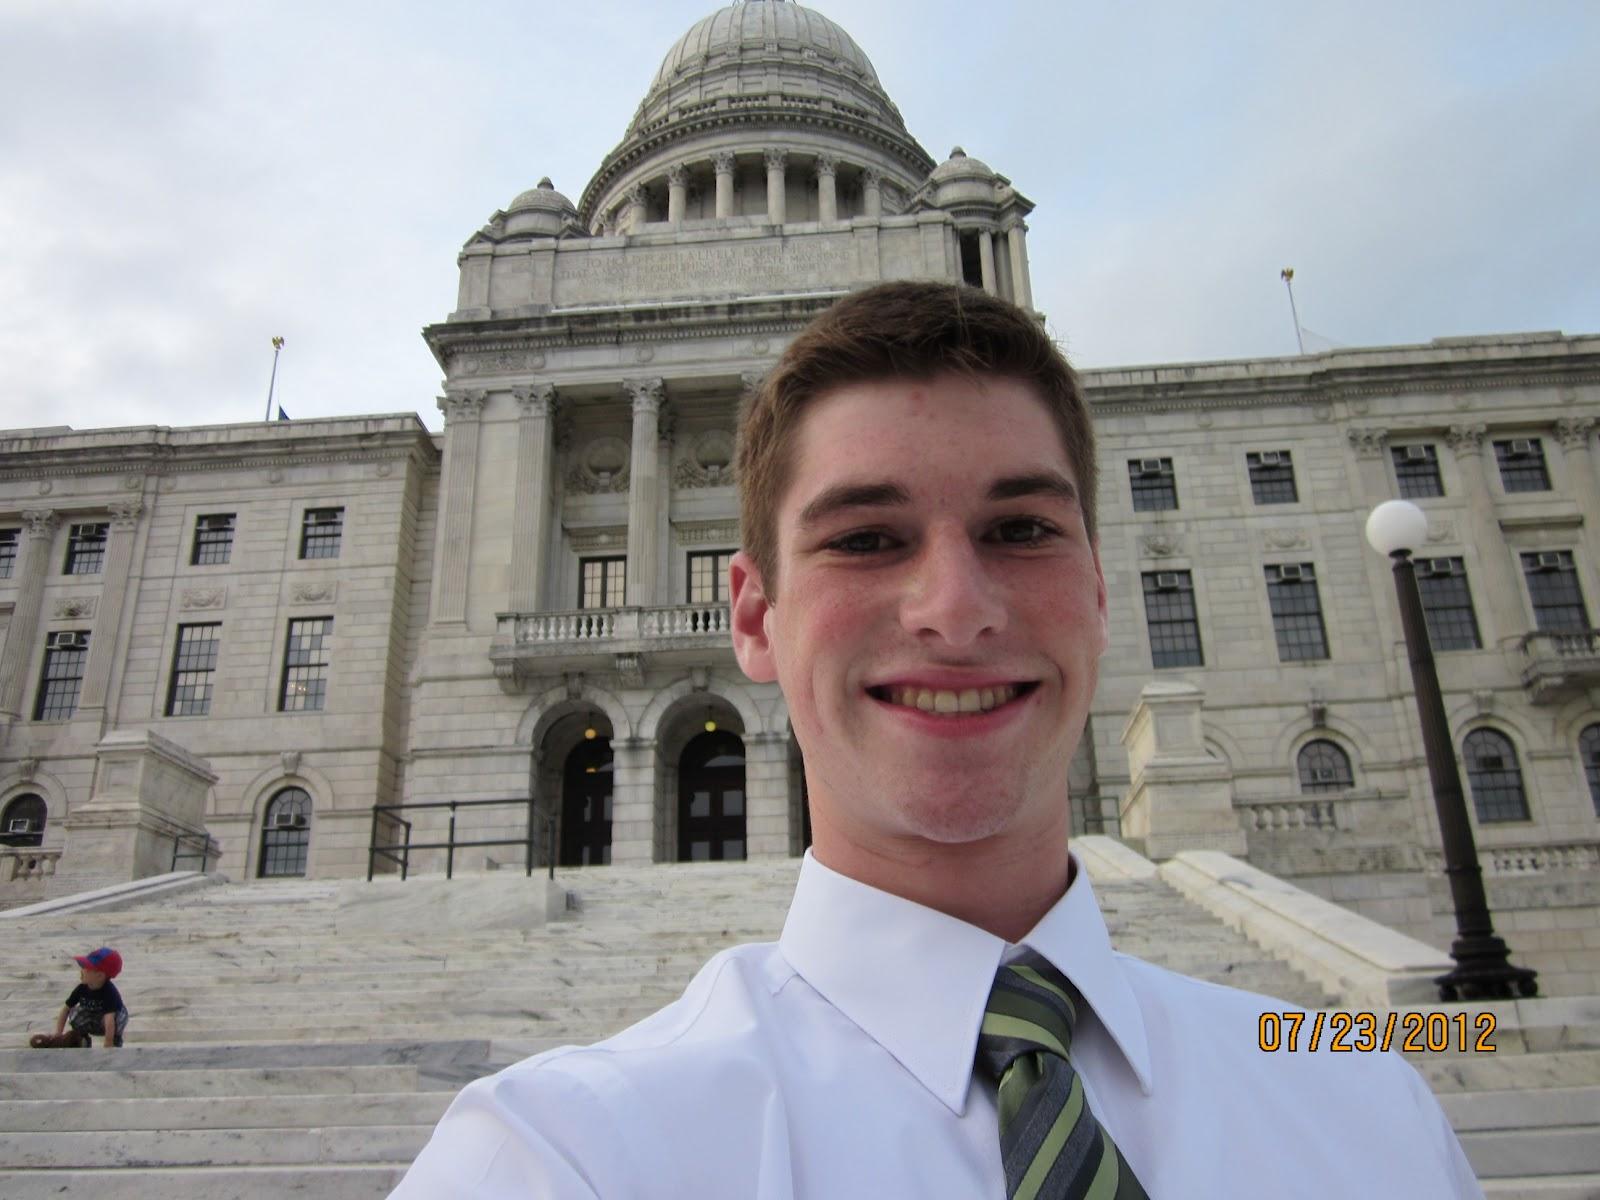 Elder Zachary Payne Cole Received Wednesday October 3 2012